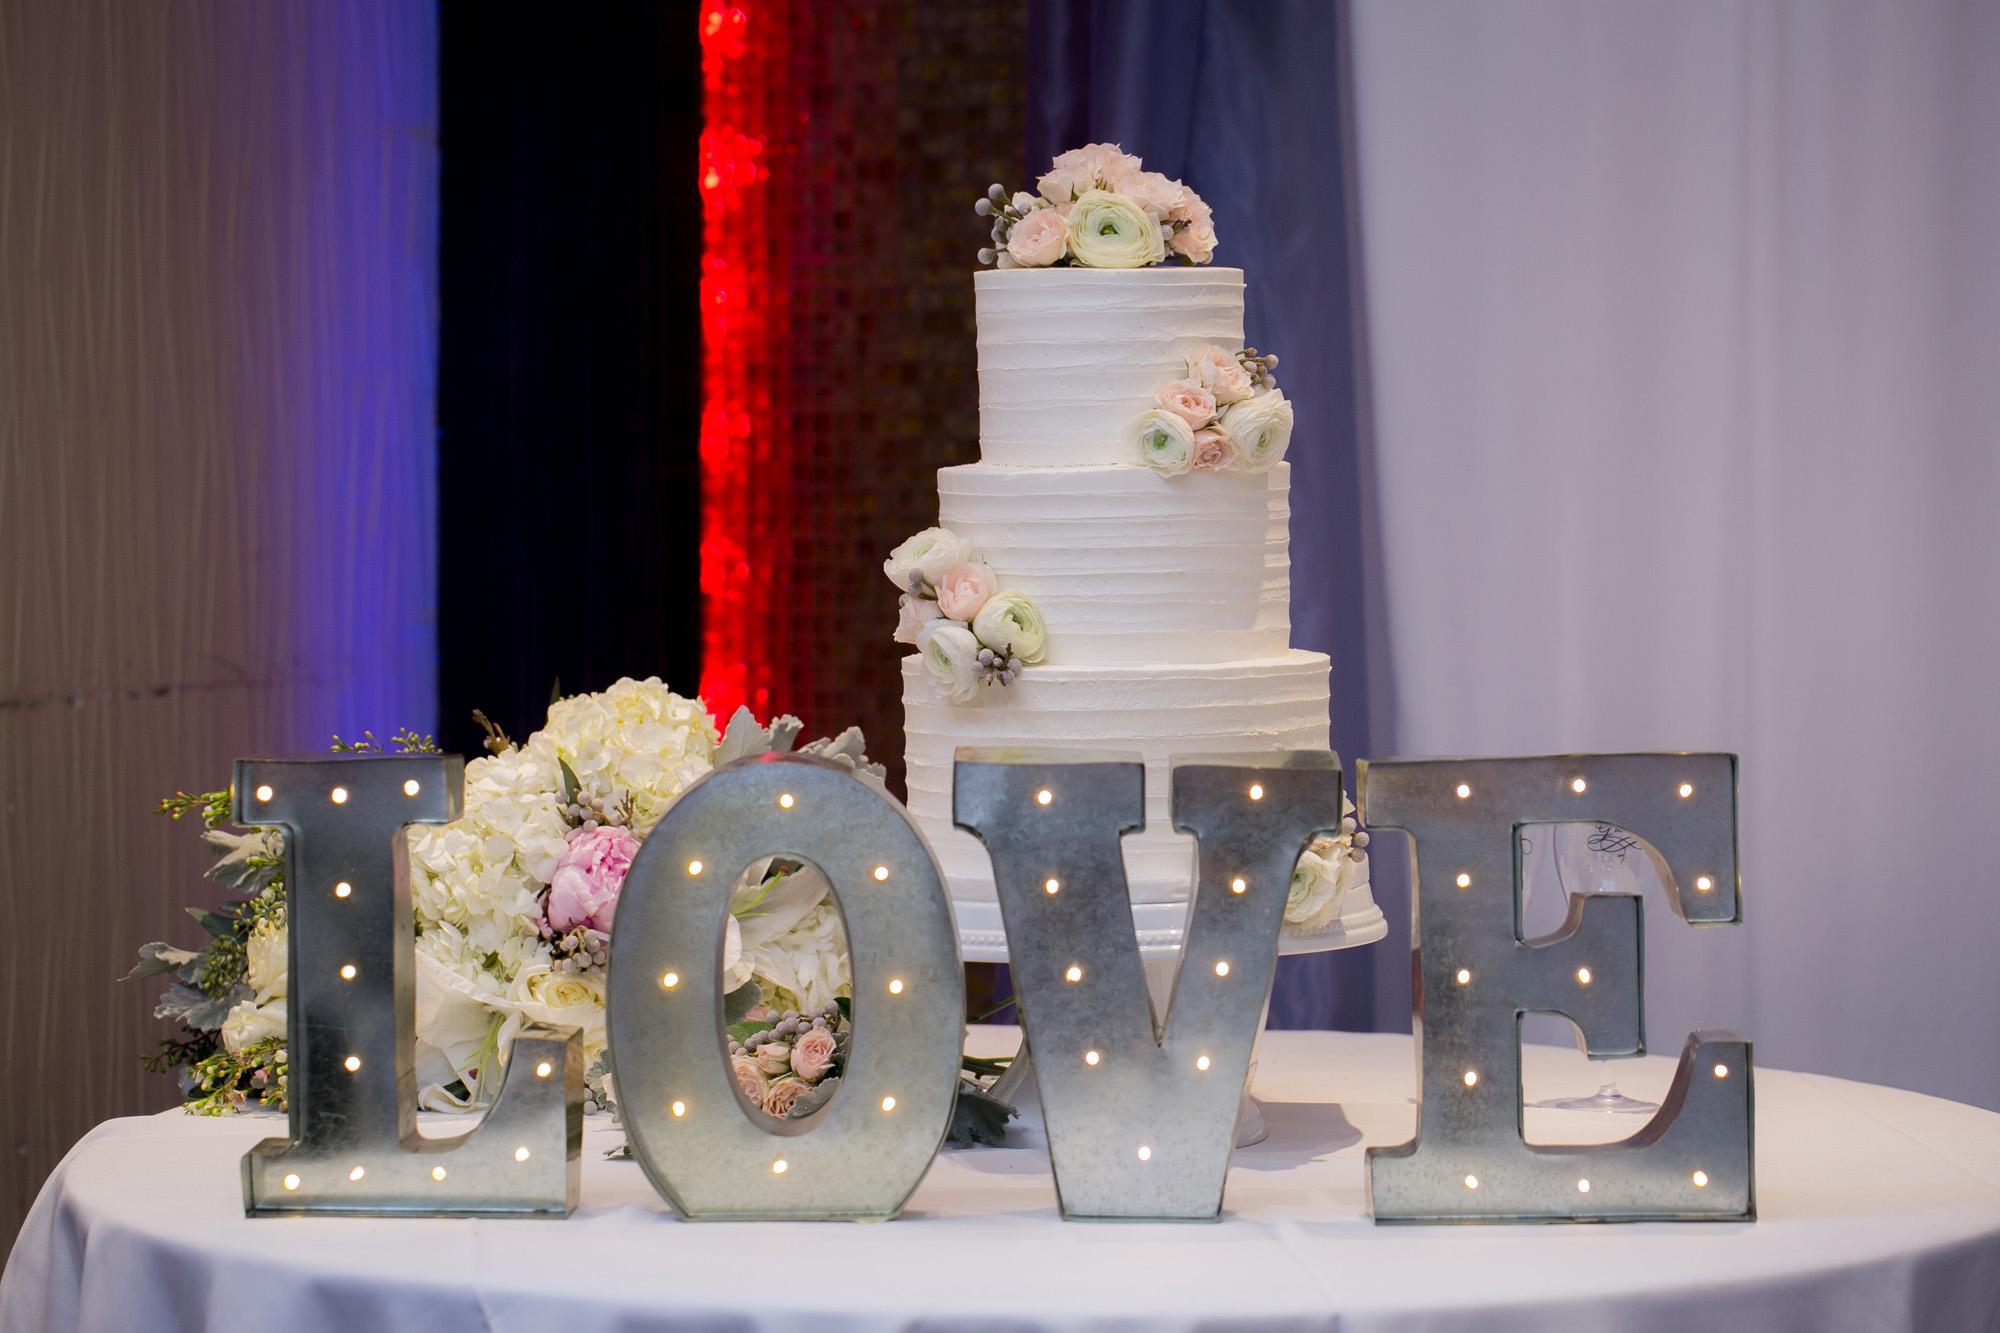 Geoff Kowalchuk JT Wedding Photo-019.jpg